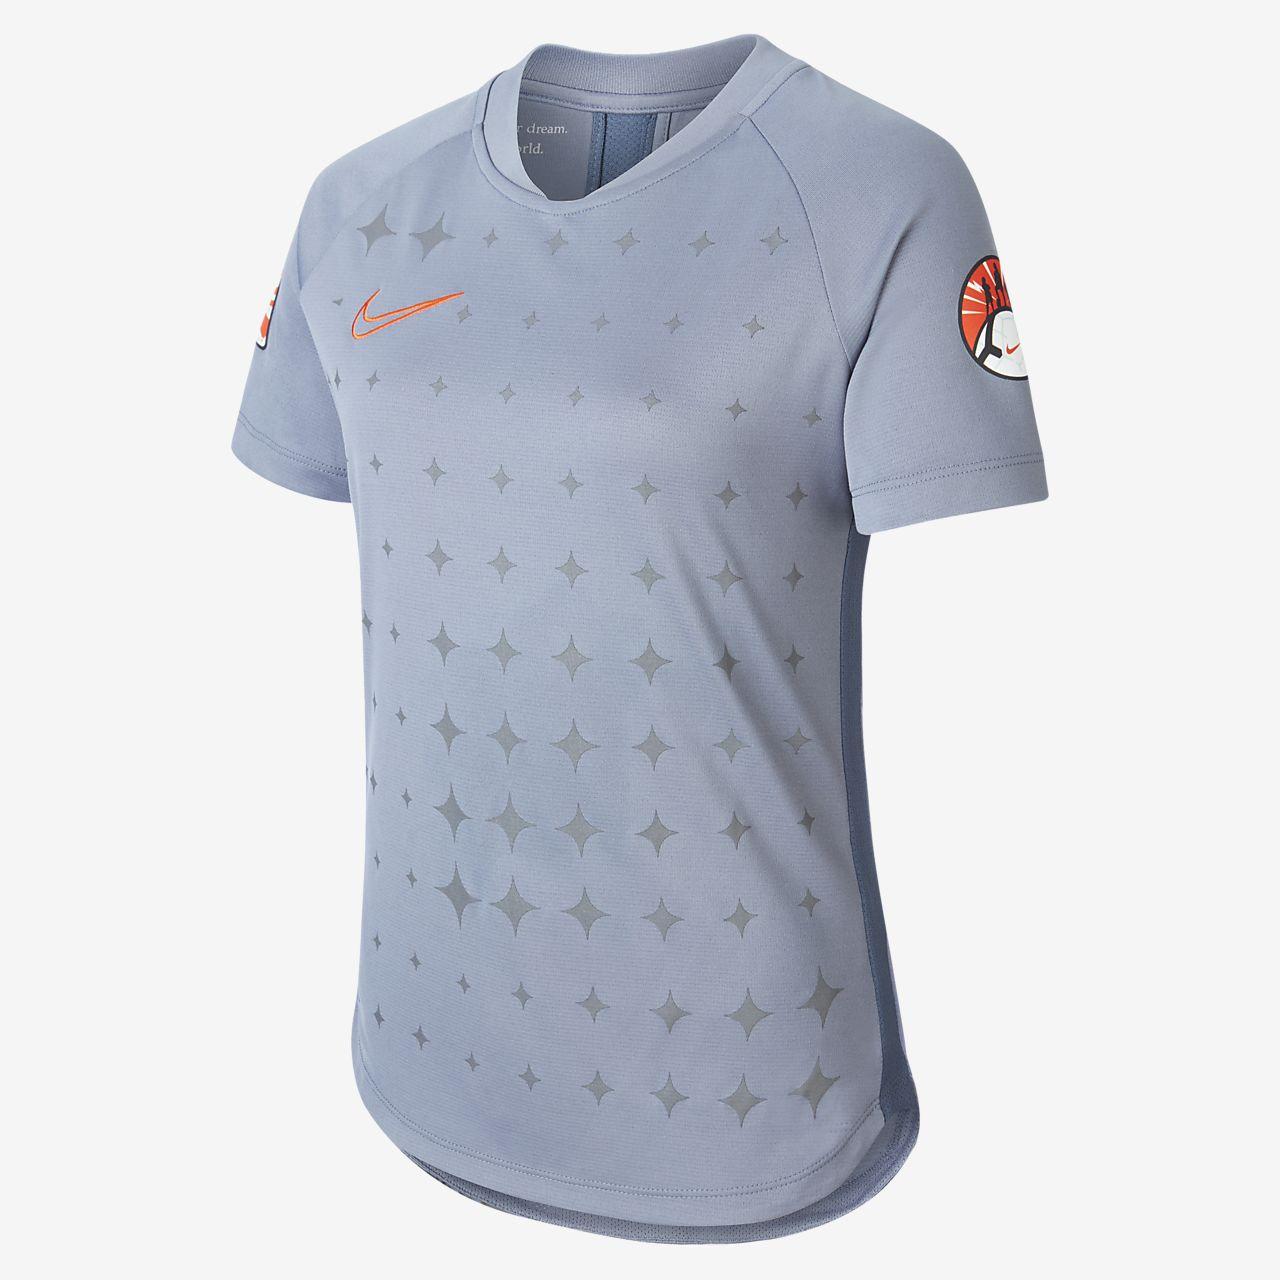 Nike Dri-FIT Kurzarm-Fußballtrikot für ältere Kinder (Mädchen)